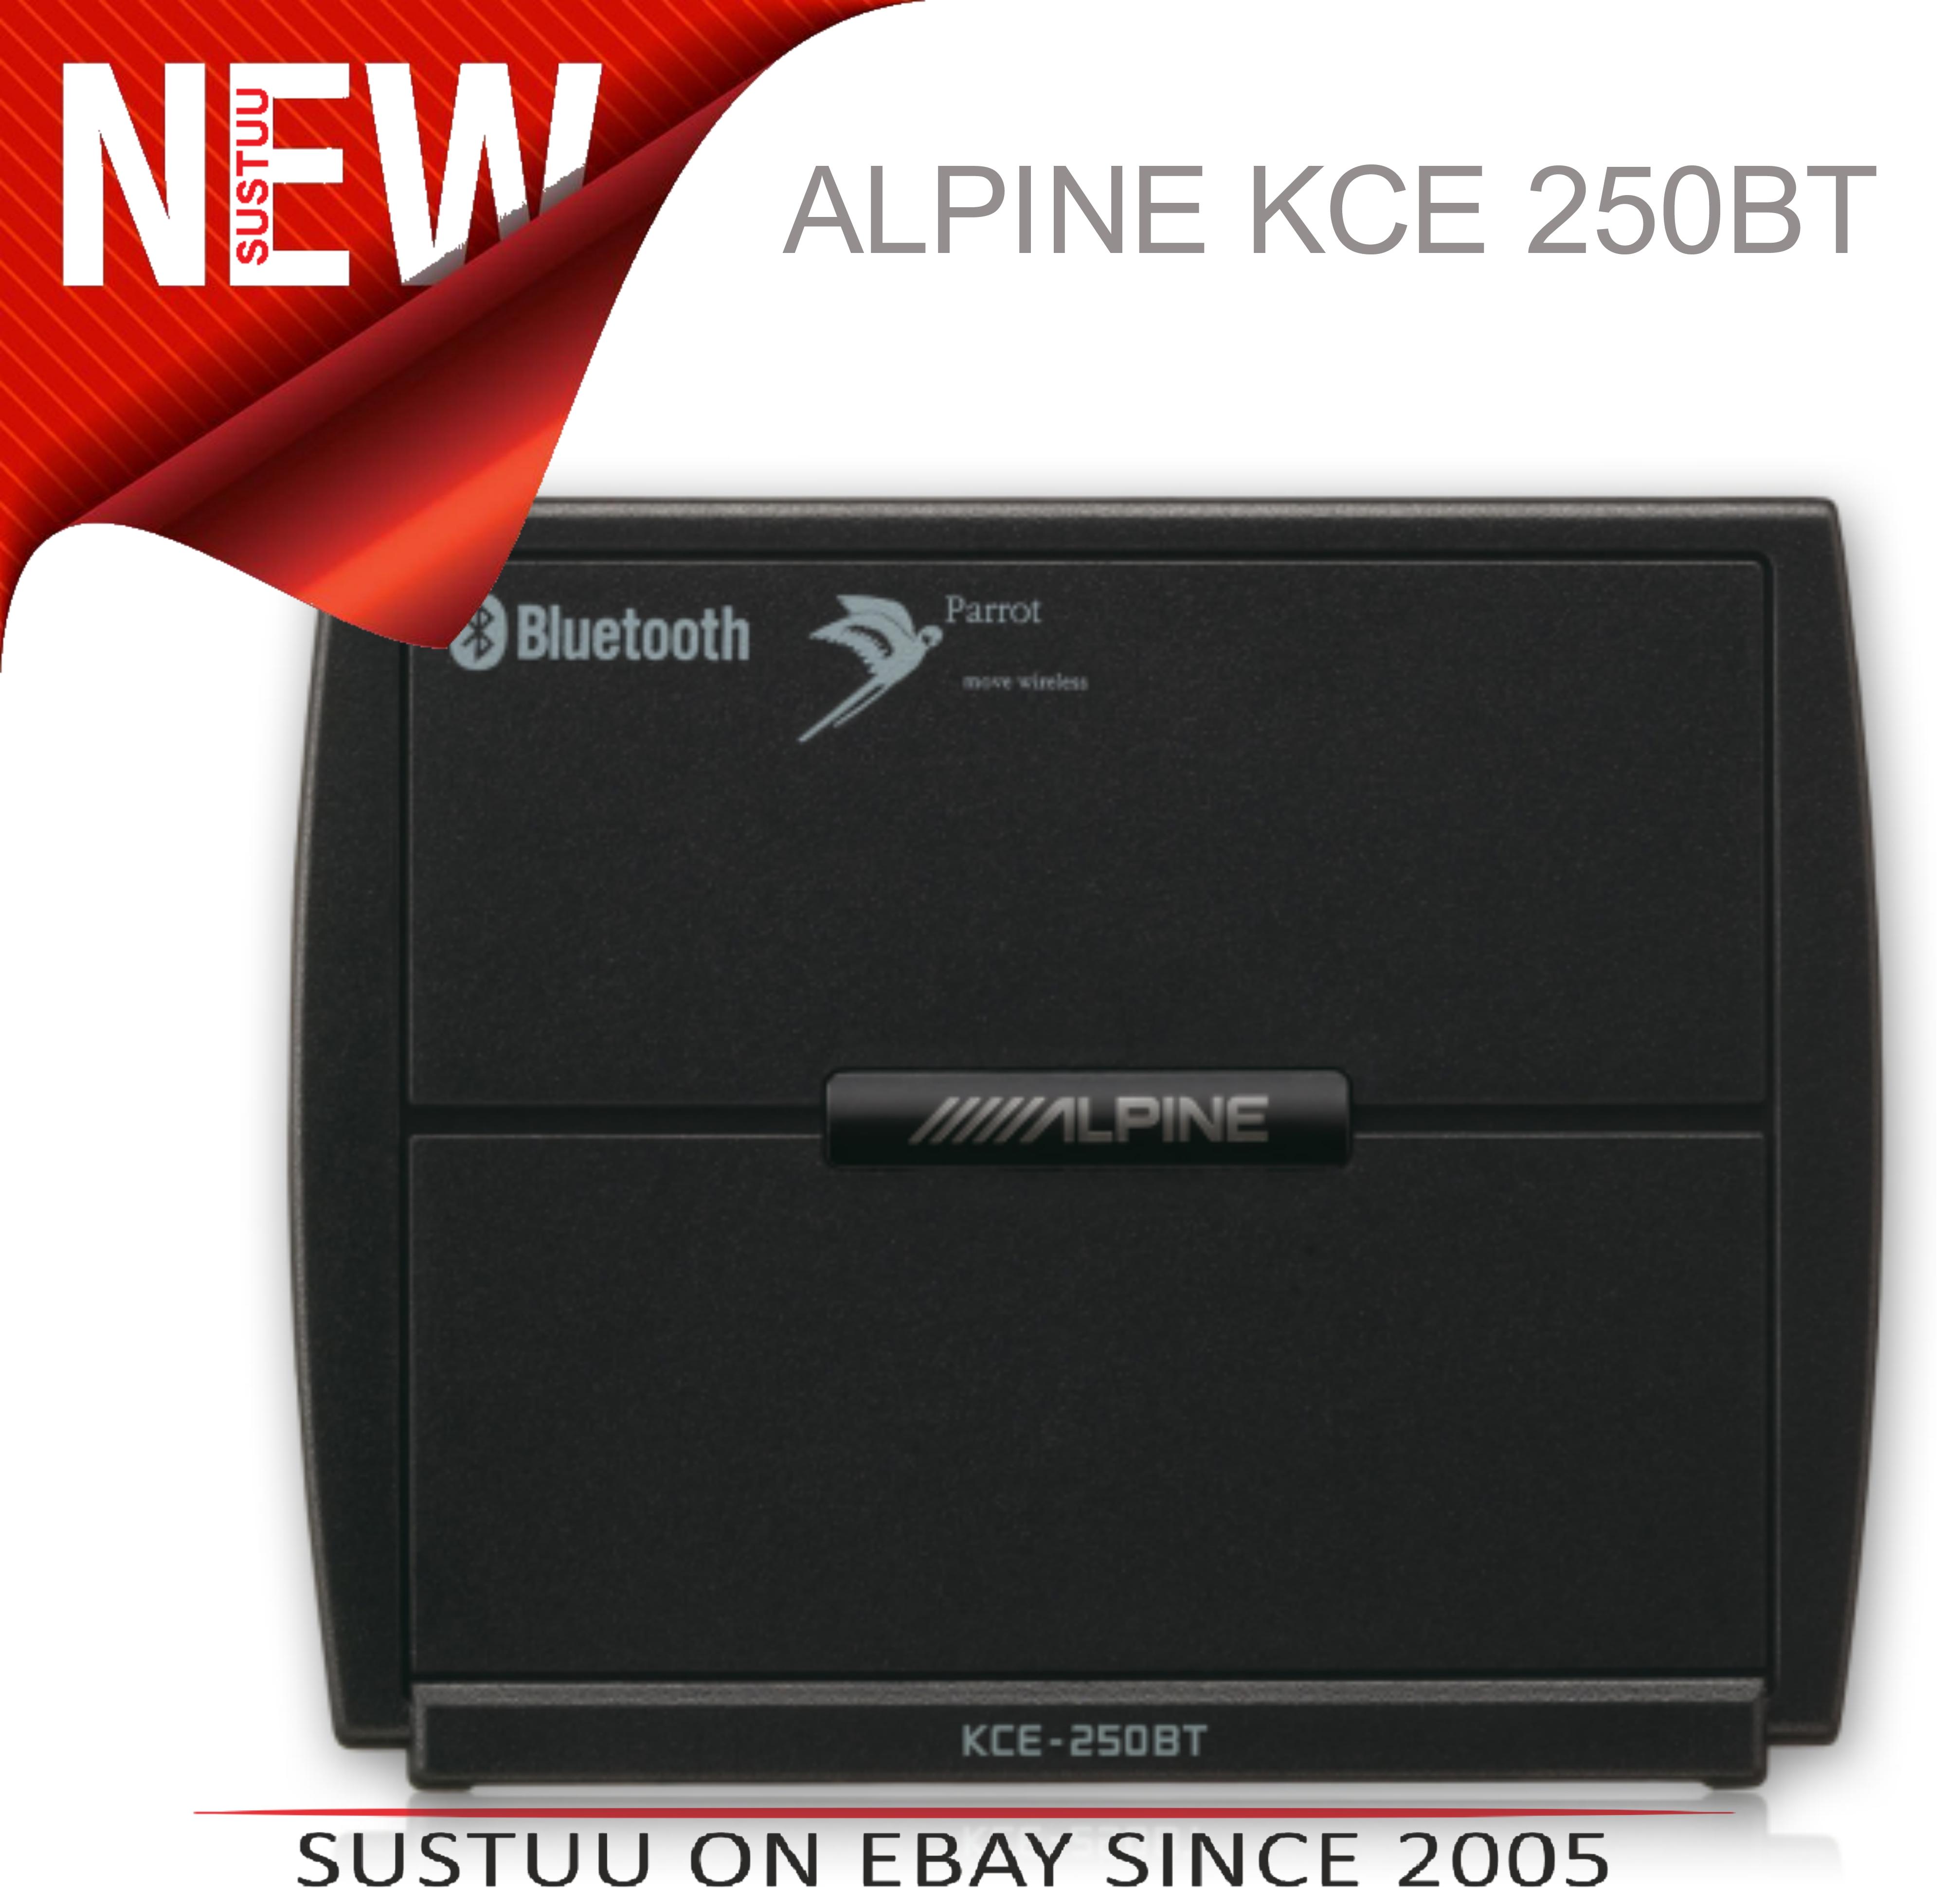 Alpine KCE 250BT PARROT BluetoothV2.0 Car Stereo IDA IXA IVA CDA LifeTime Update